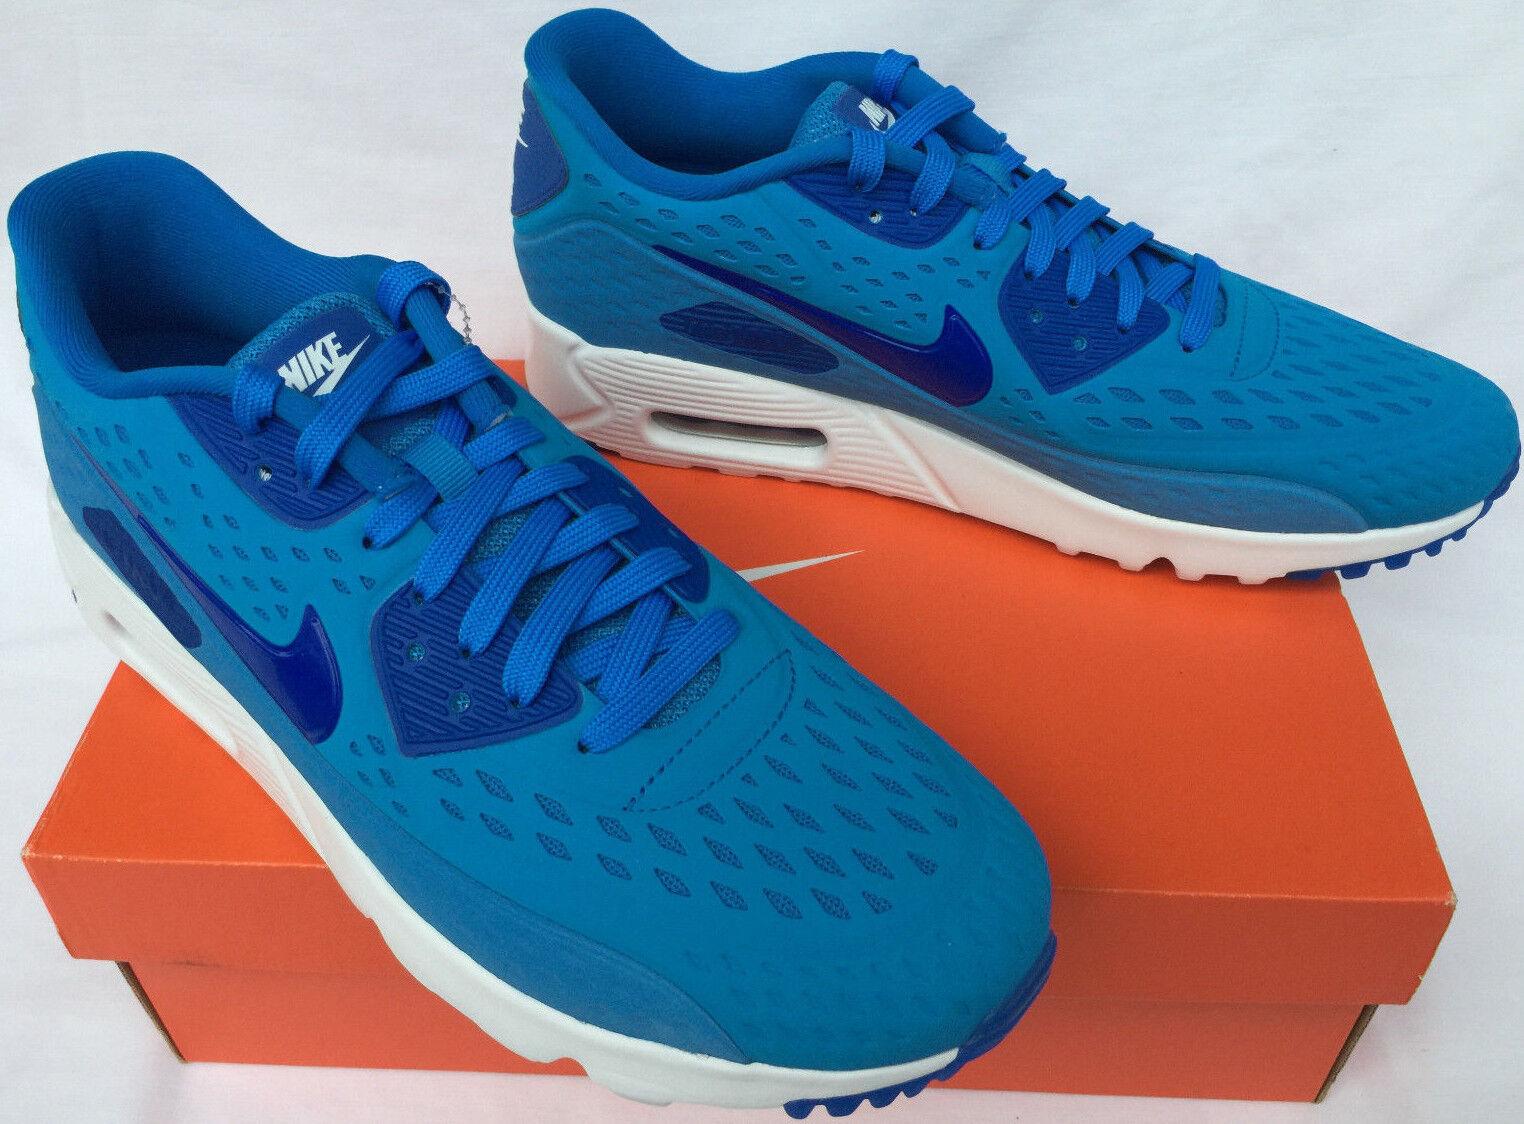 Nike Marathon Air Max 90 Ultra Breathe 725222-404 Reflect Marathon Nike fonctionnement chaussures homme 12 520650